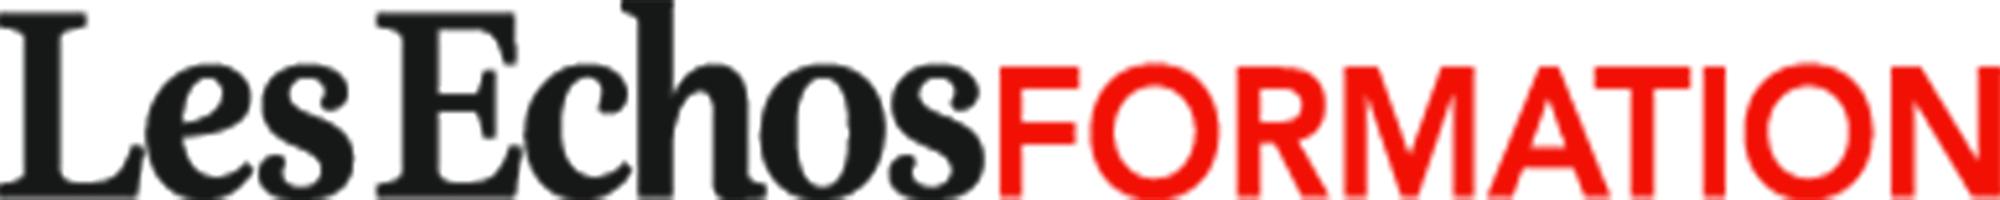 the Les Echos Formation logo.